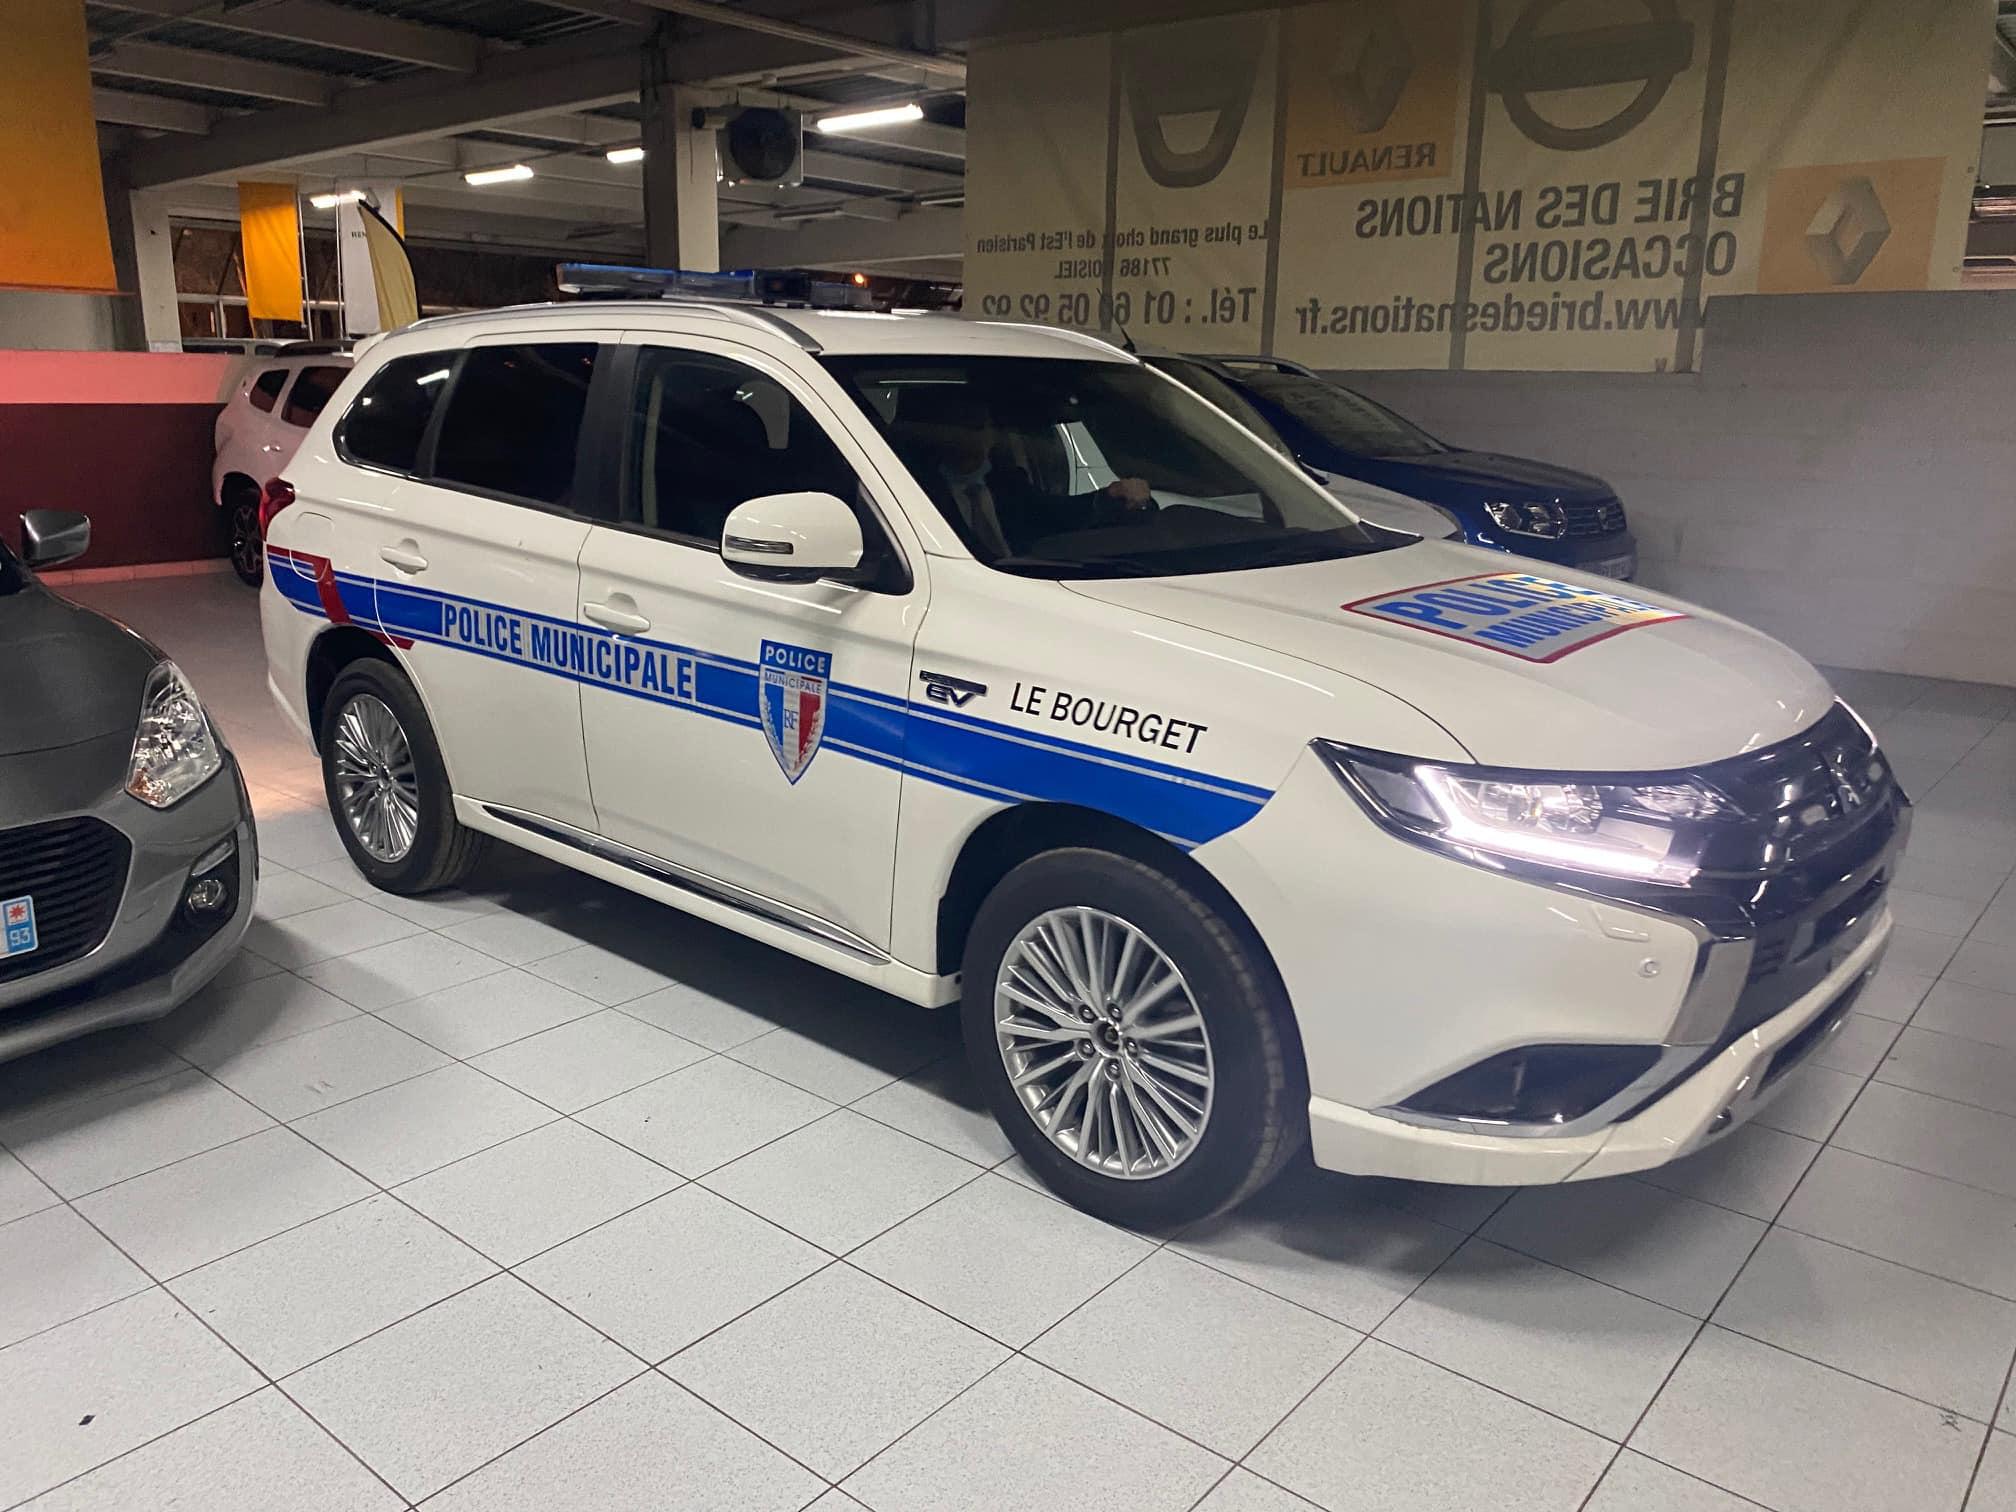 police municipale – MITSUBISHI OUTLANDER